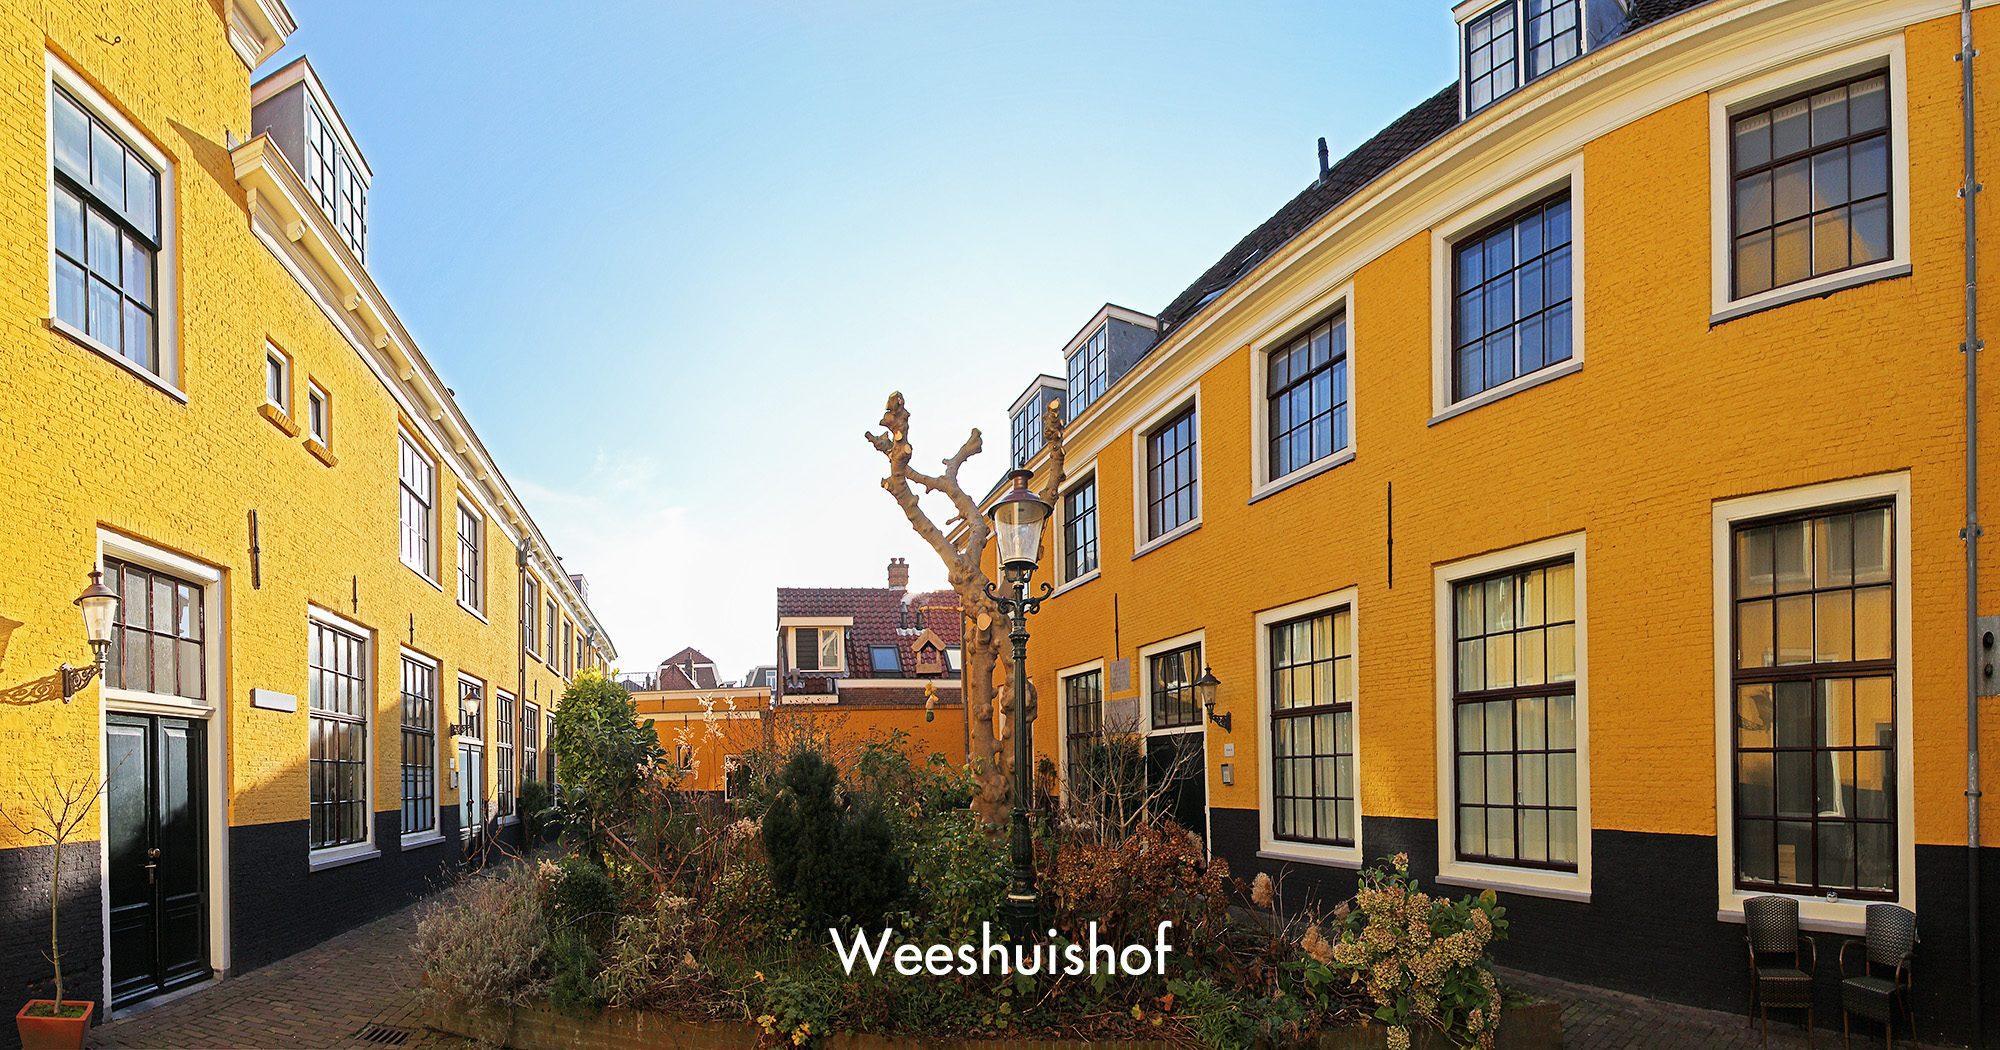 Weeshuishof